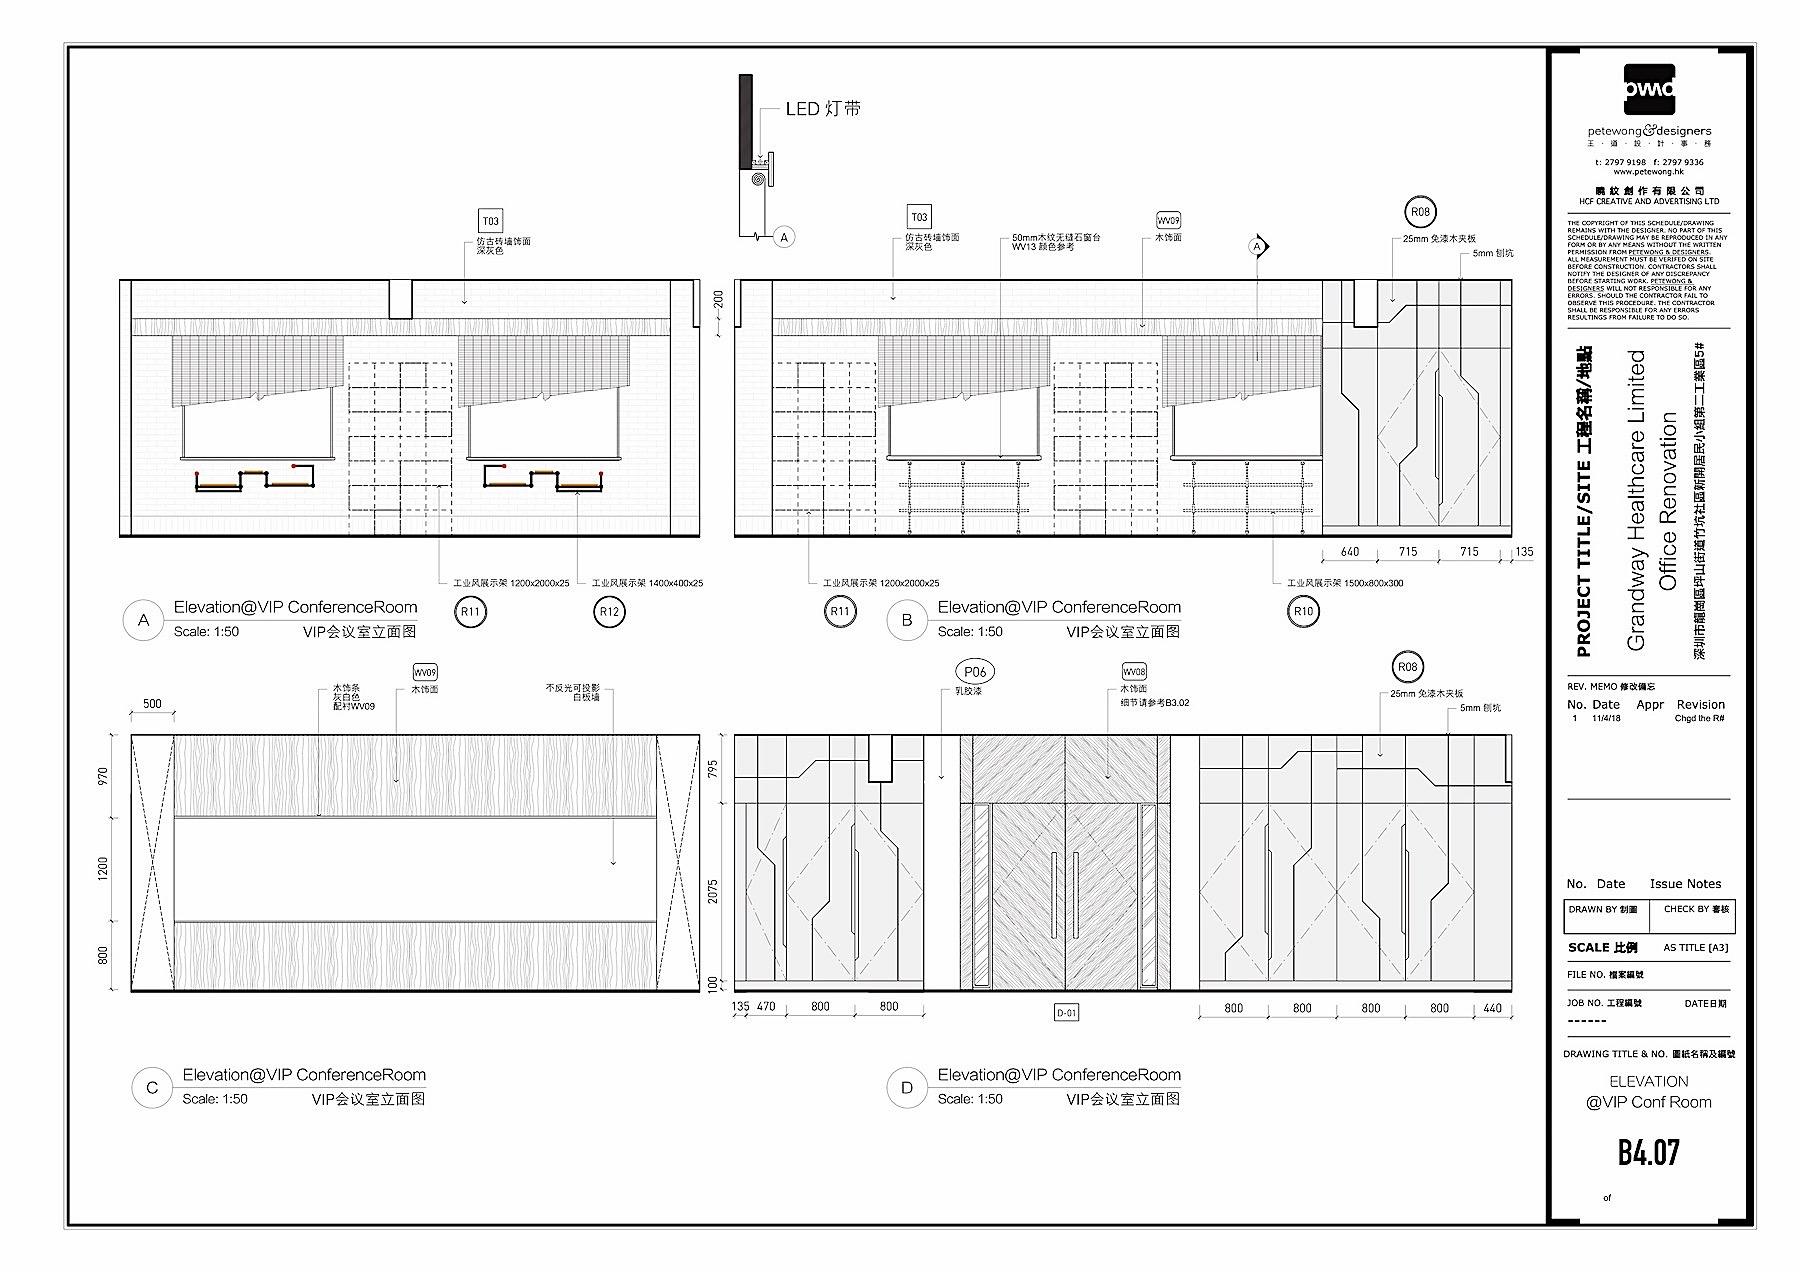 Grandway Office Renovation 2018 Drawing 15